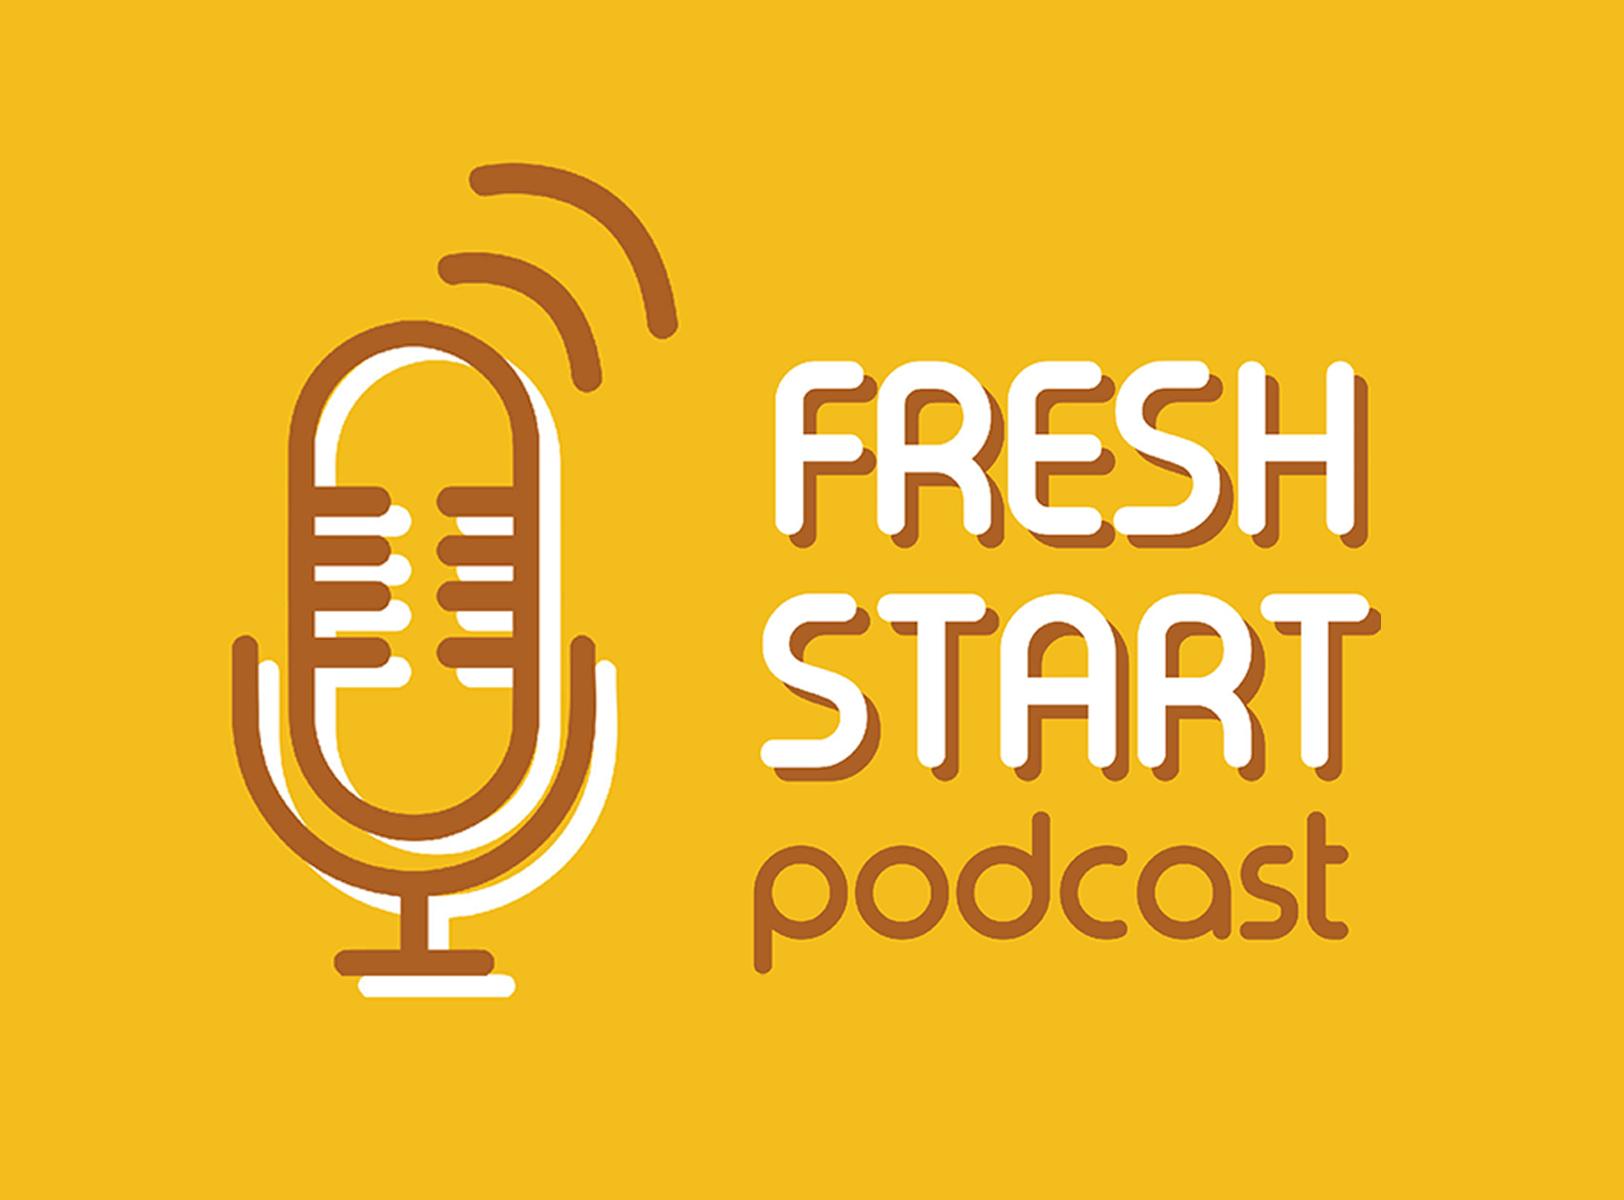 Fresh Start: Podcast News (6/21/2019 Fri.)